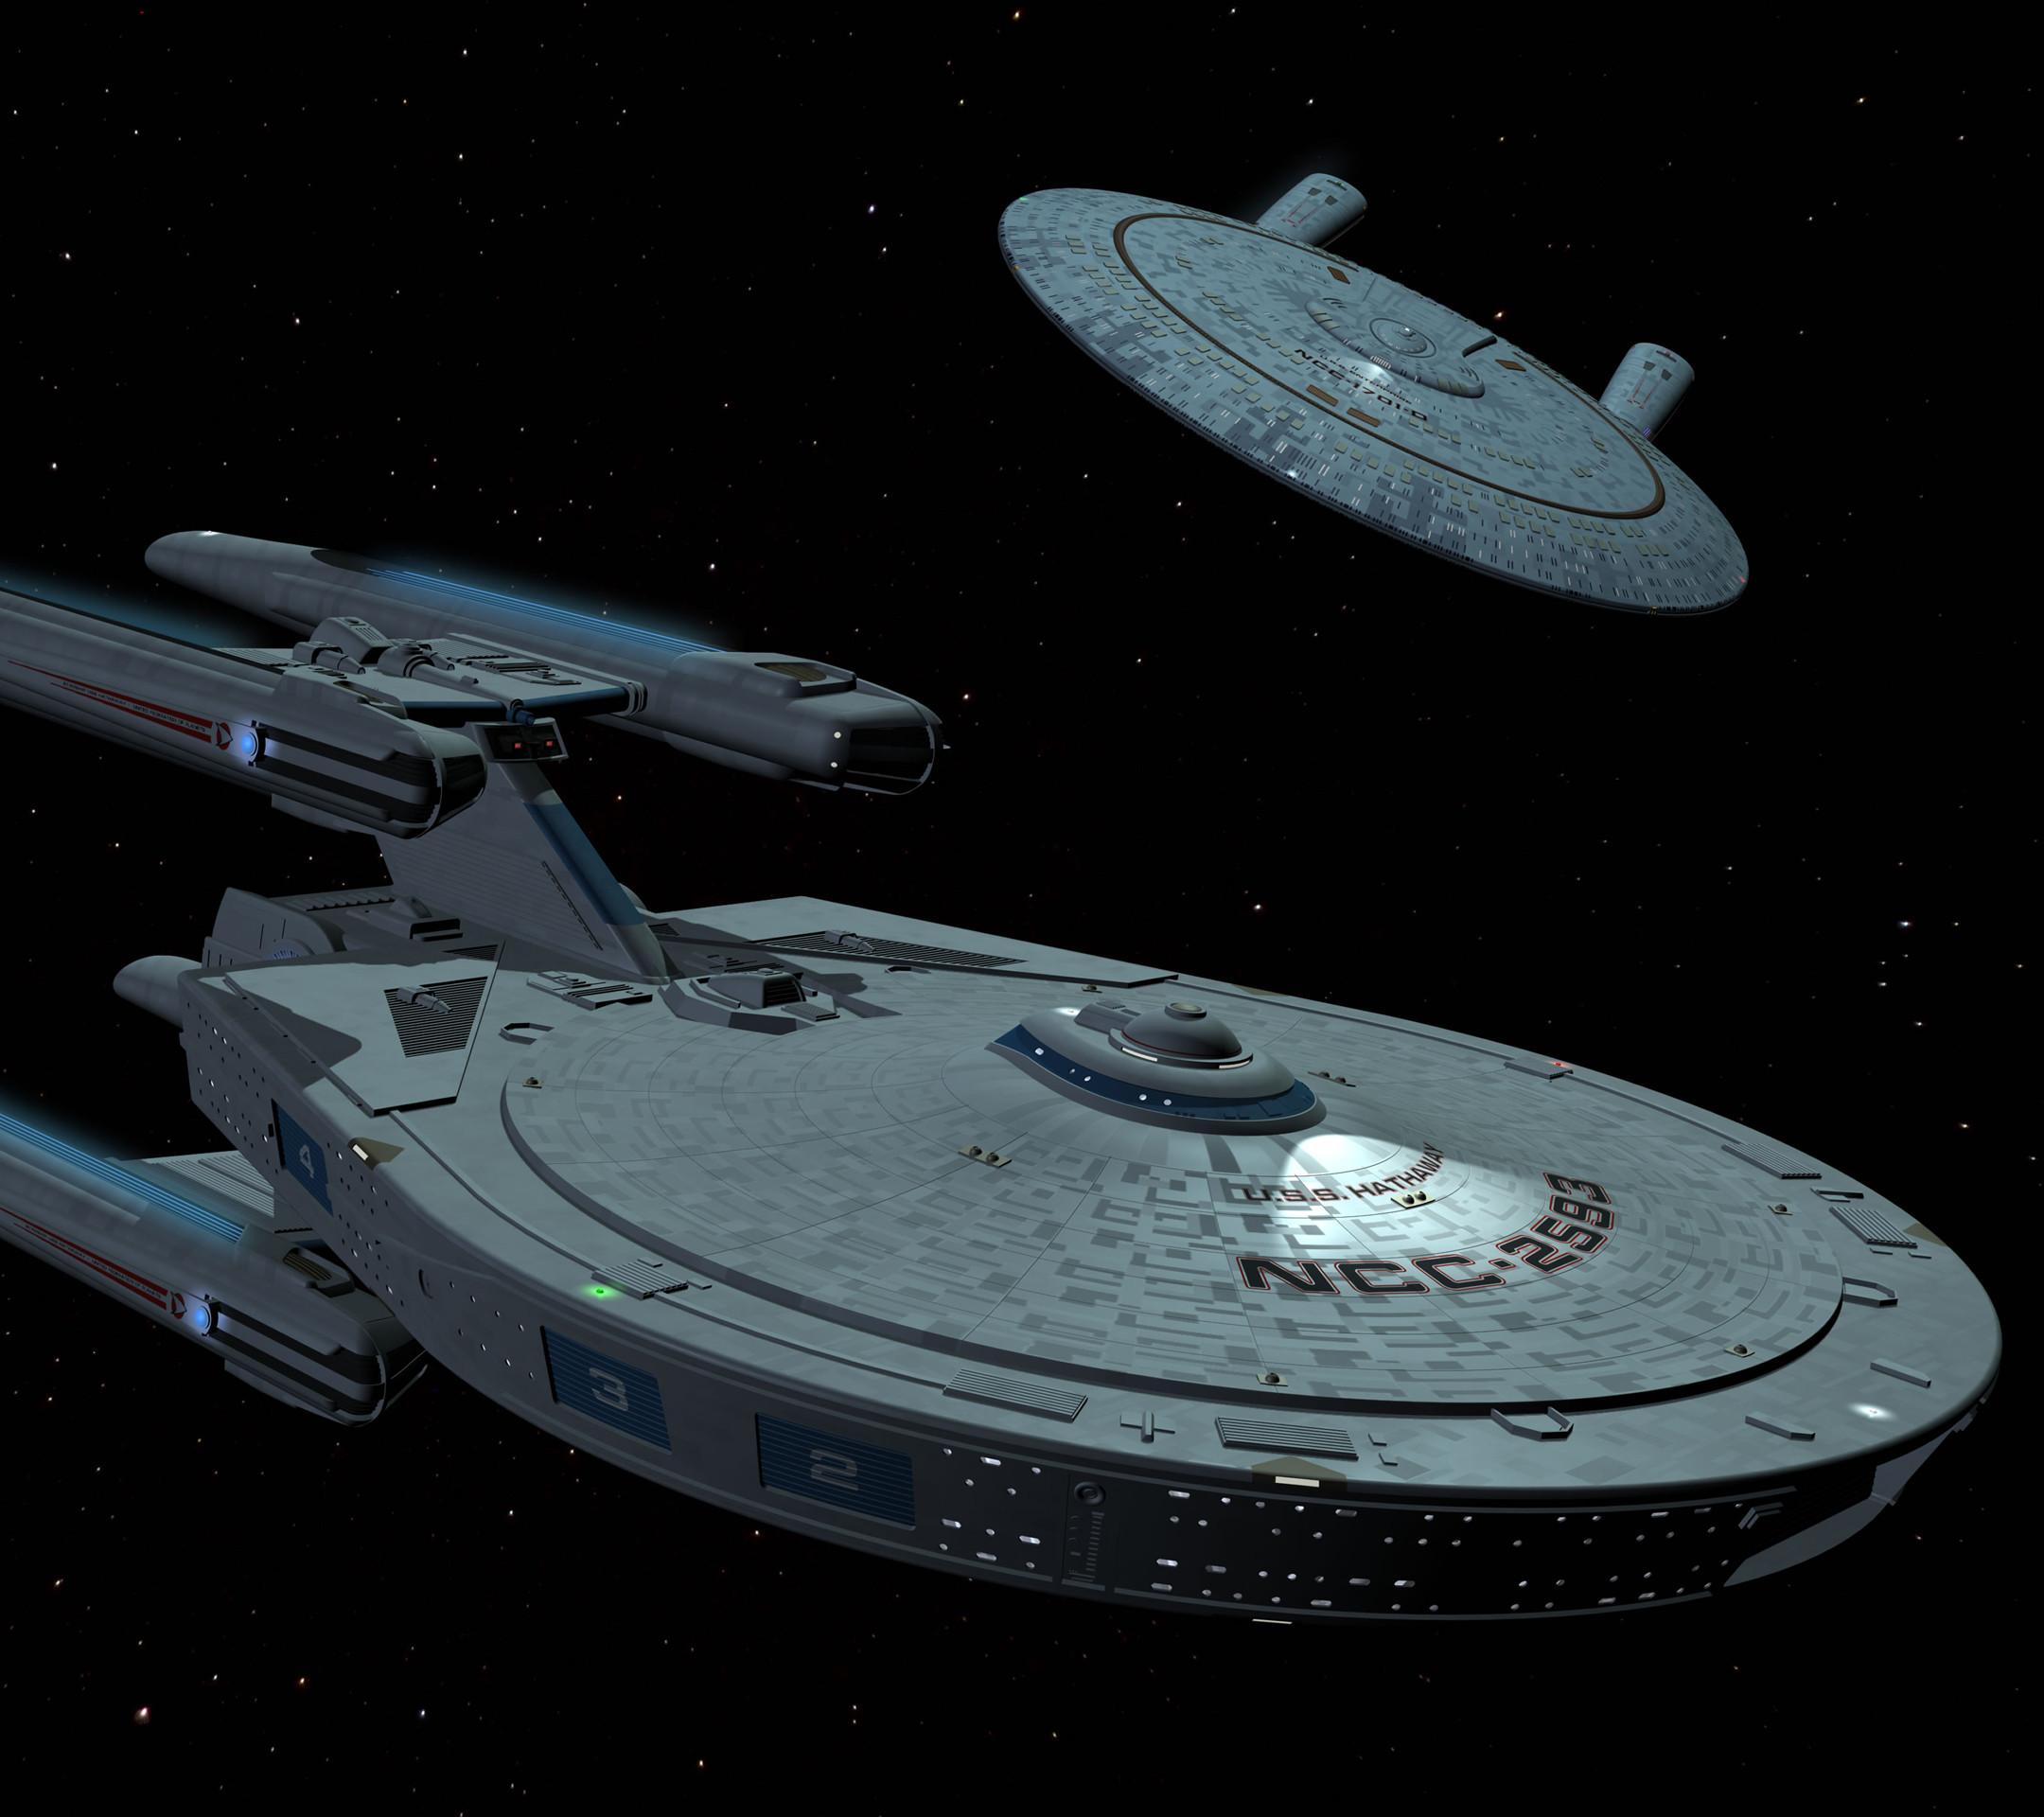 USS Hathaway in Star Trek Wallpaper